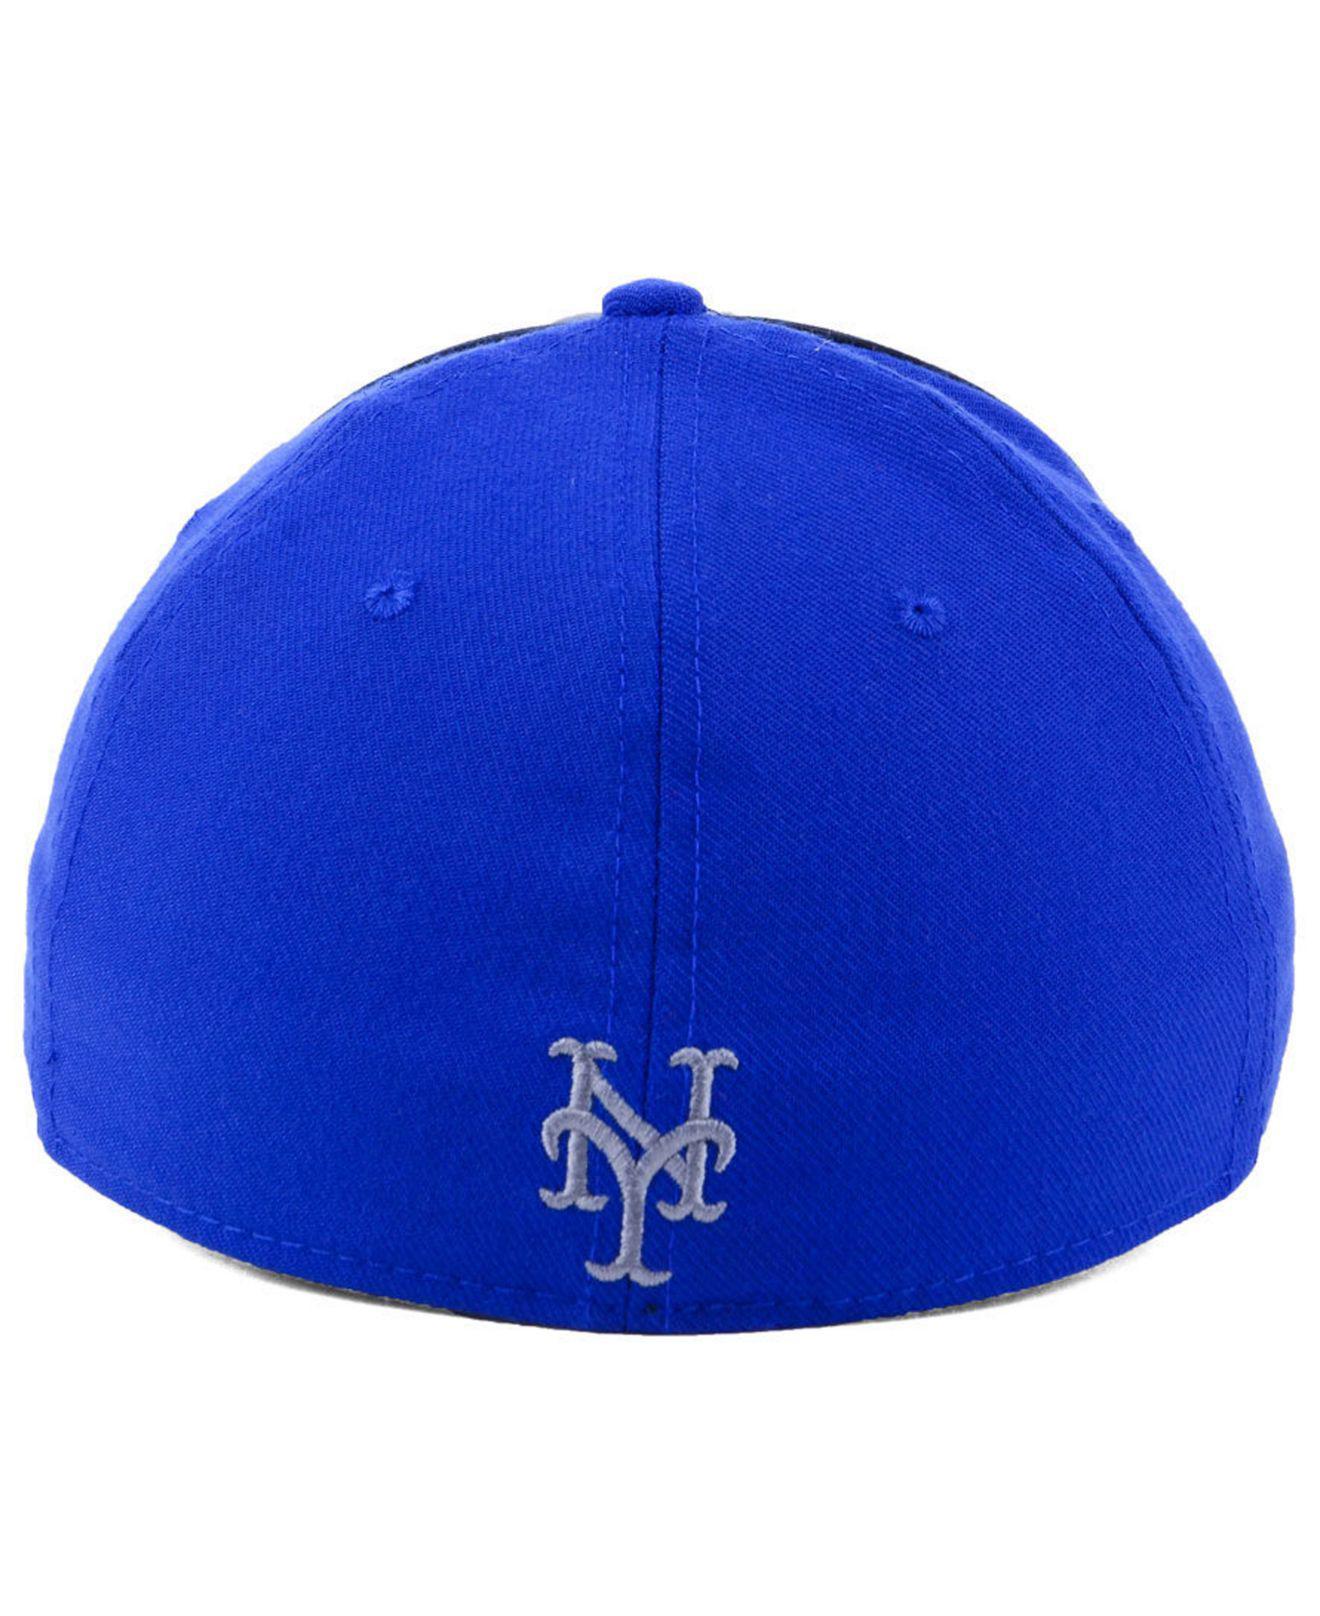 online store 67c56 552dd Nike - Blue New York Mets Team Color Reflective Swooshflex Cap for Men -  Lyst. View fullscreen